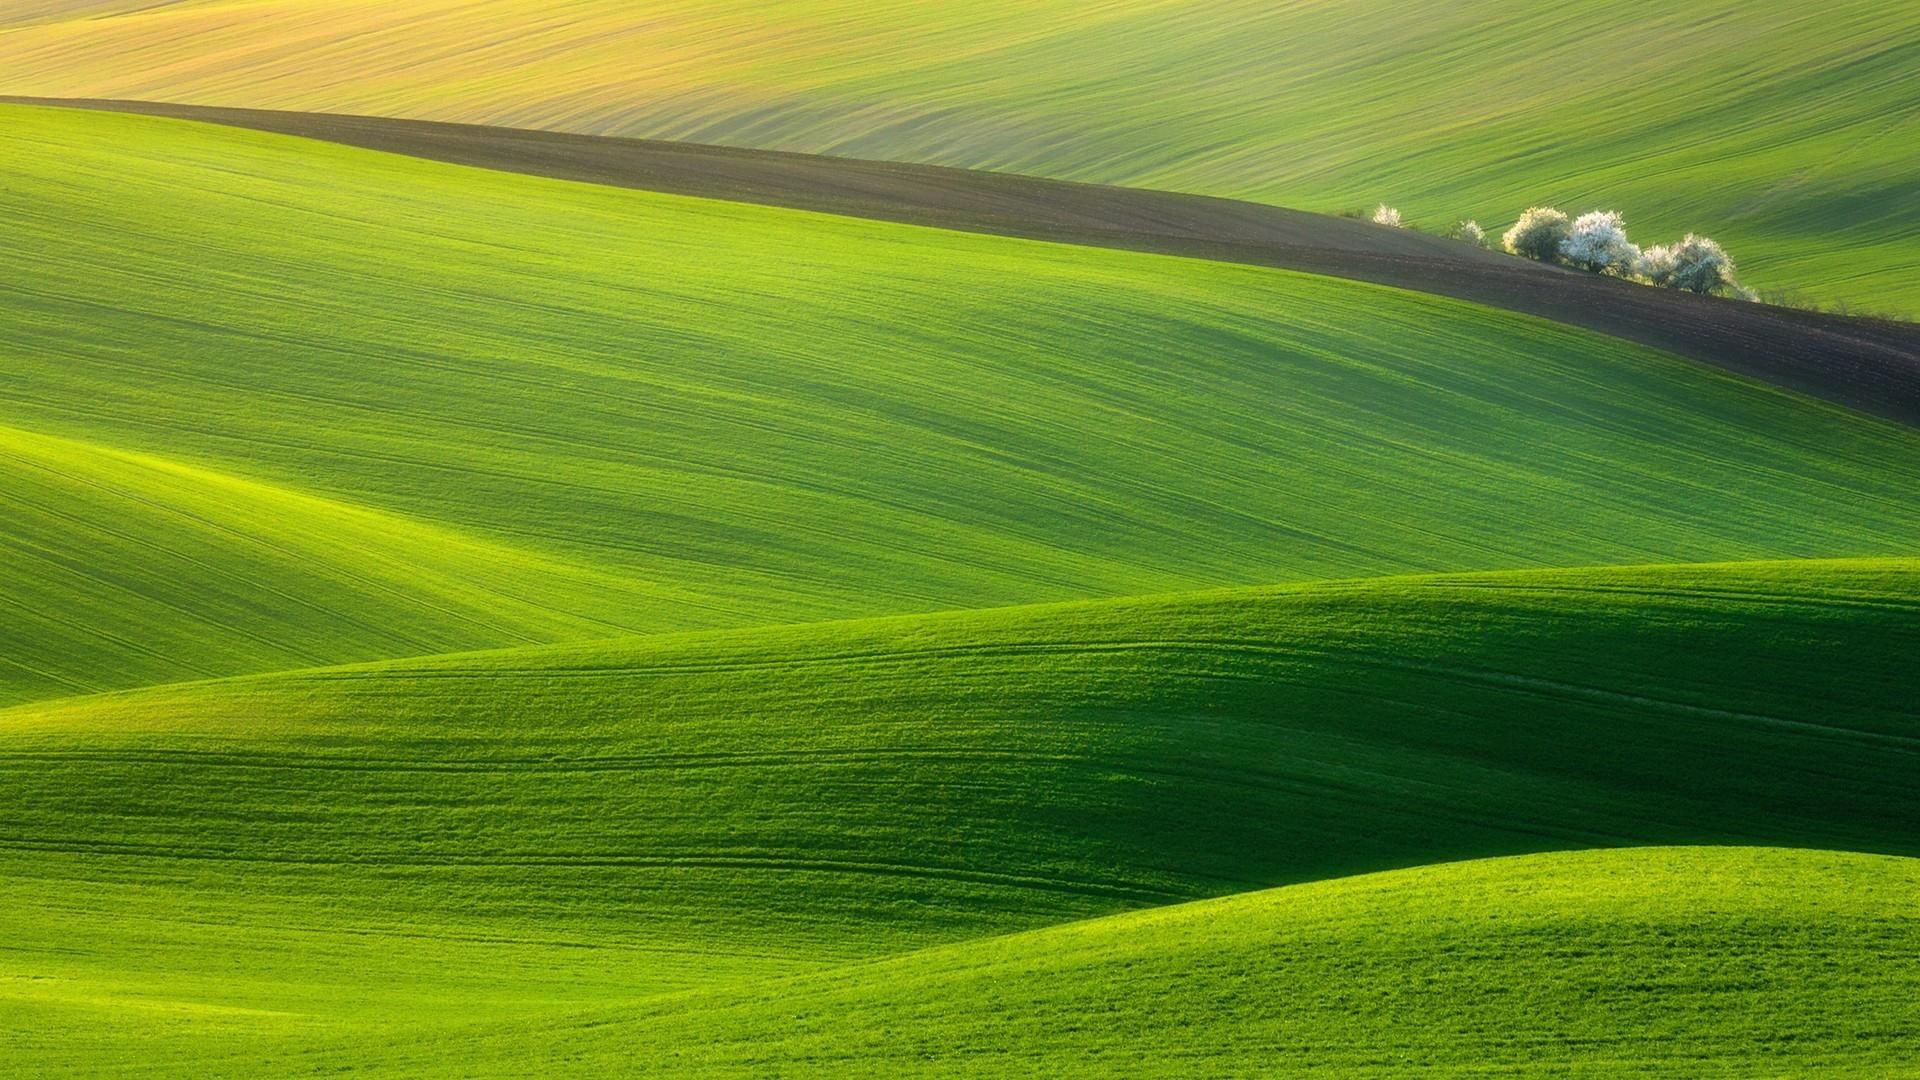 Download Wallpaper 1920x1080 Field Grass Sky Green Full Hd 1080p